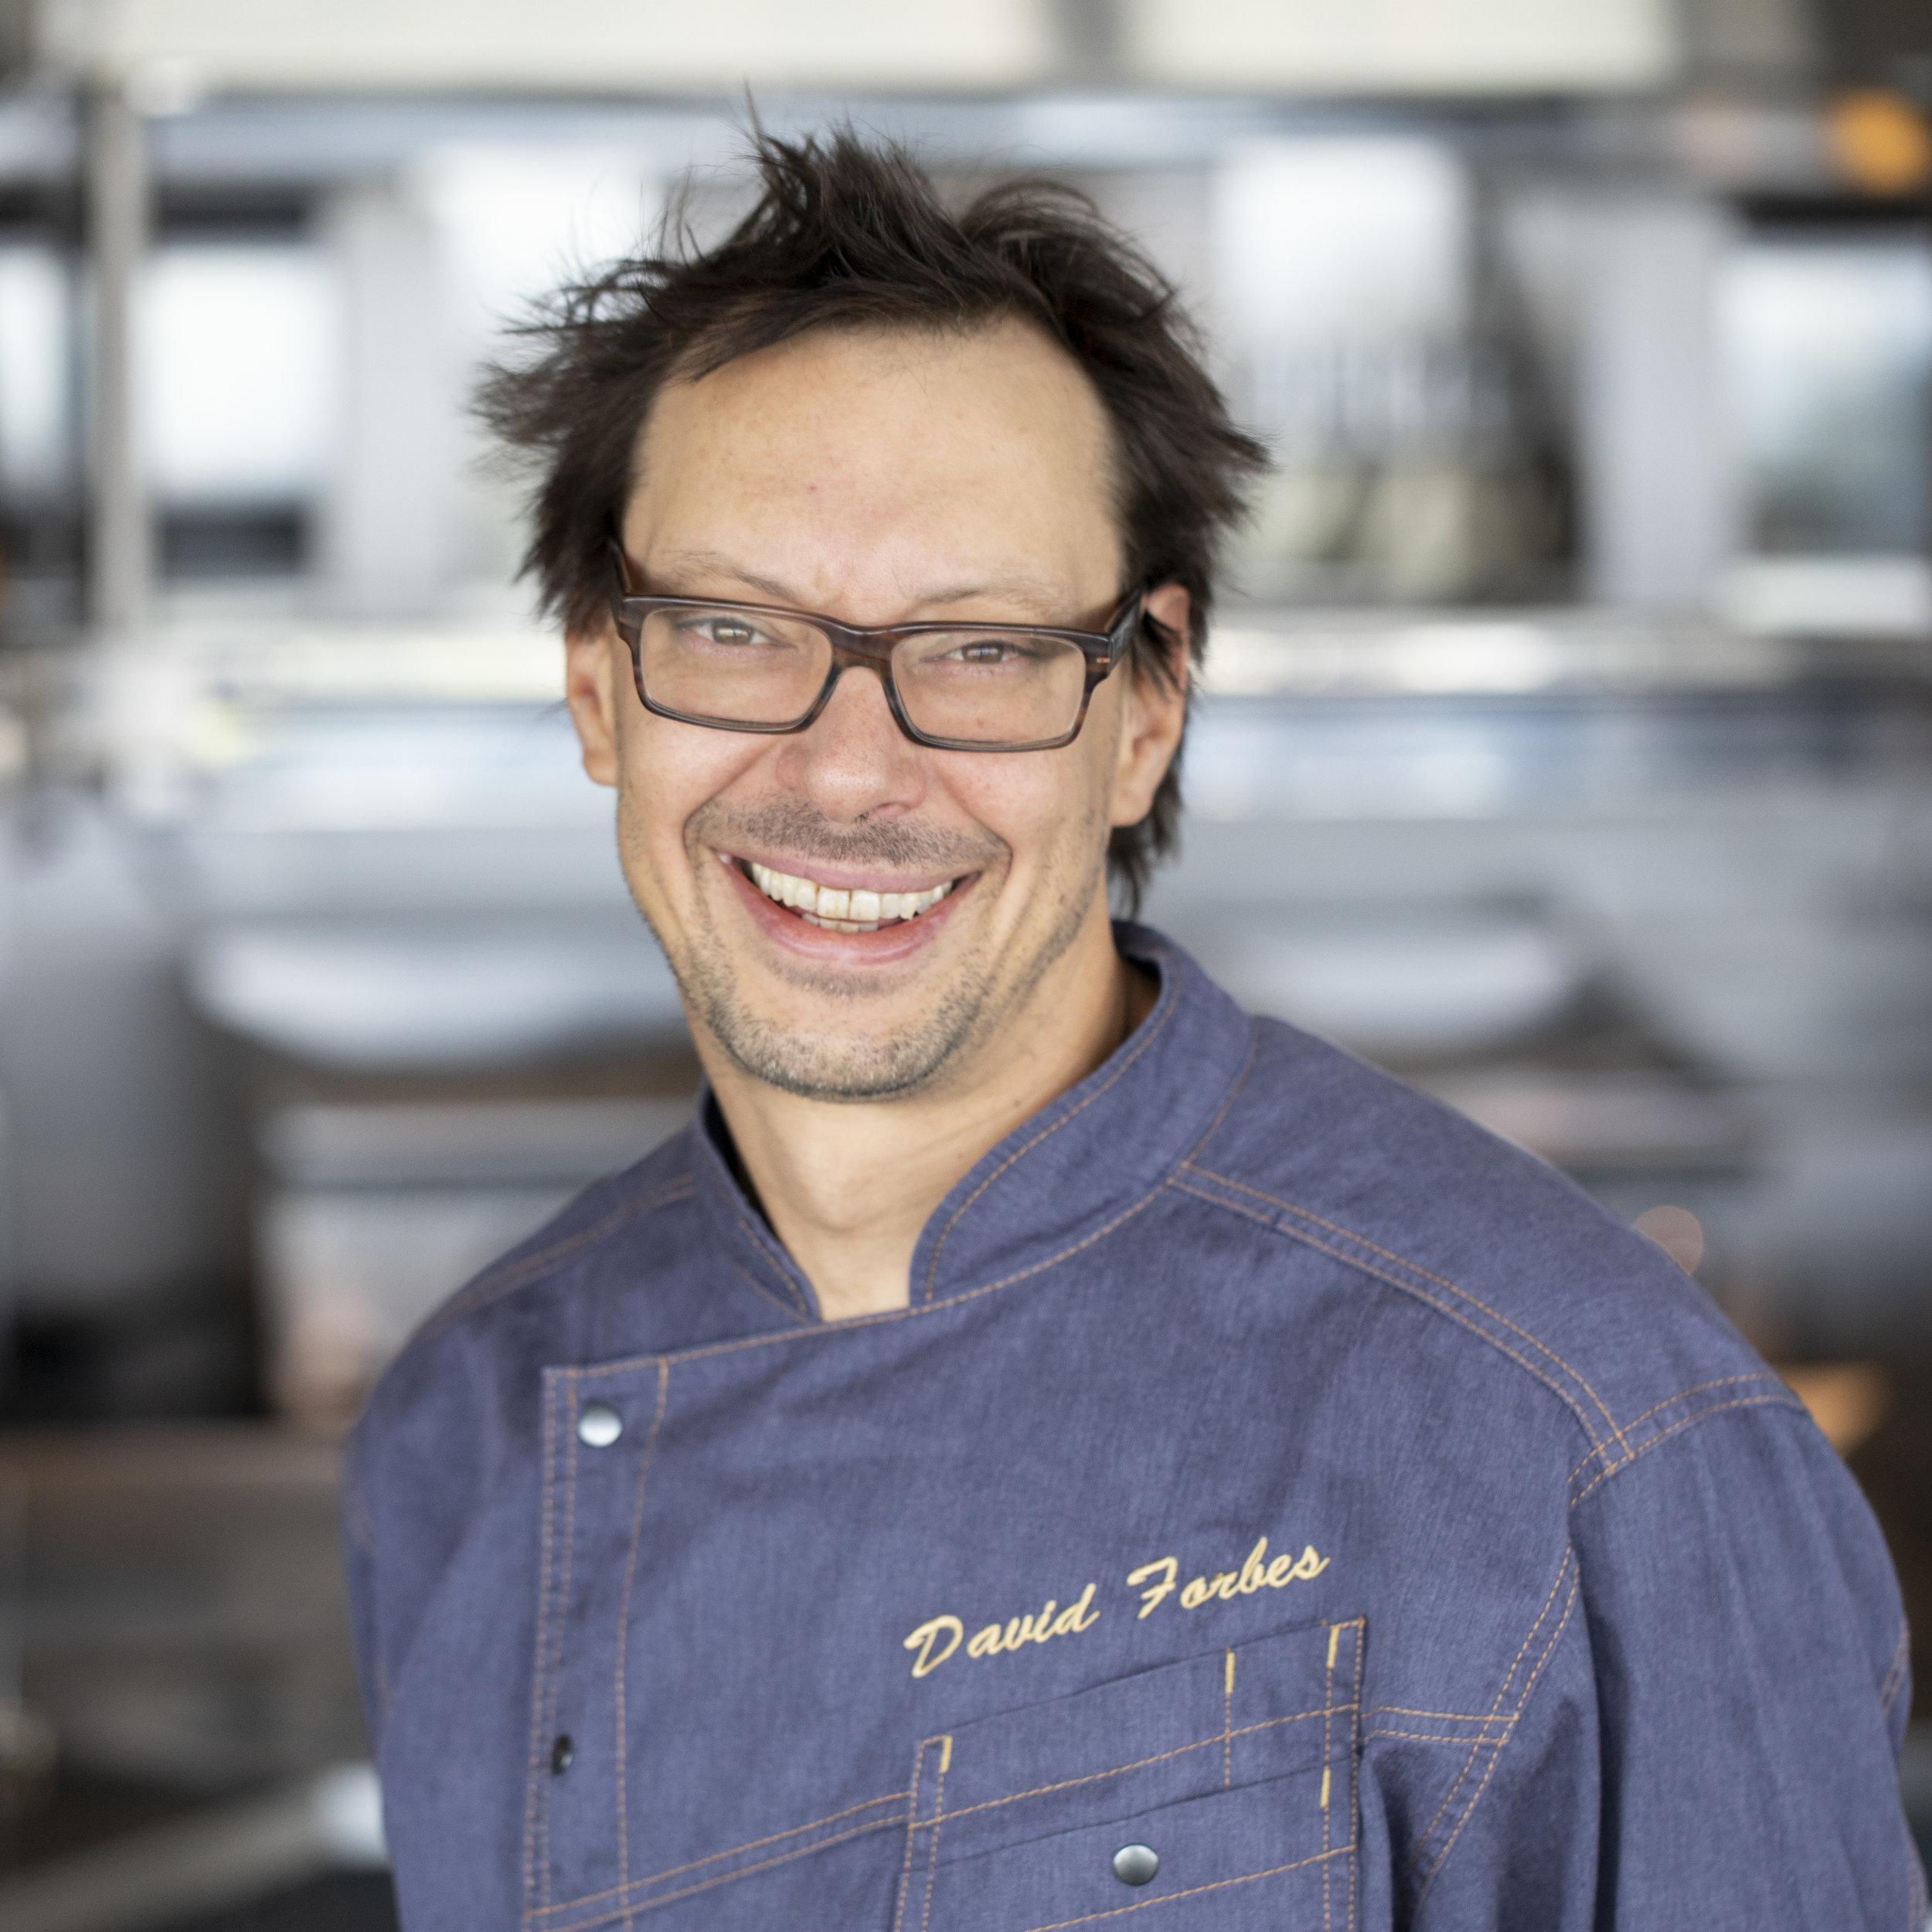 David Forbes_Chef CIEL! (corpo).jpg